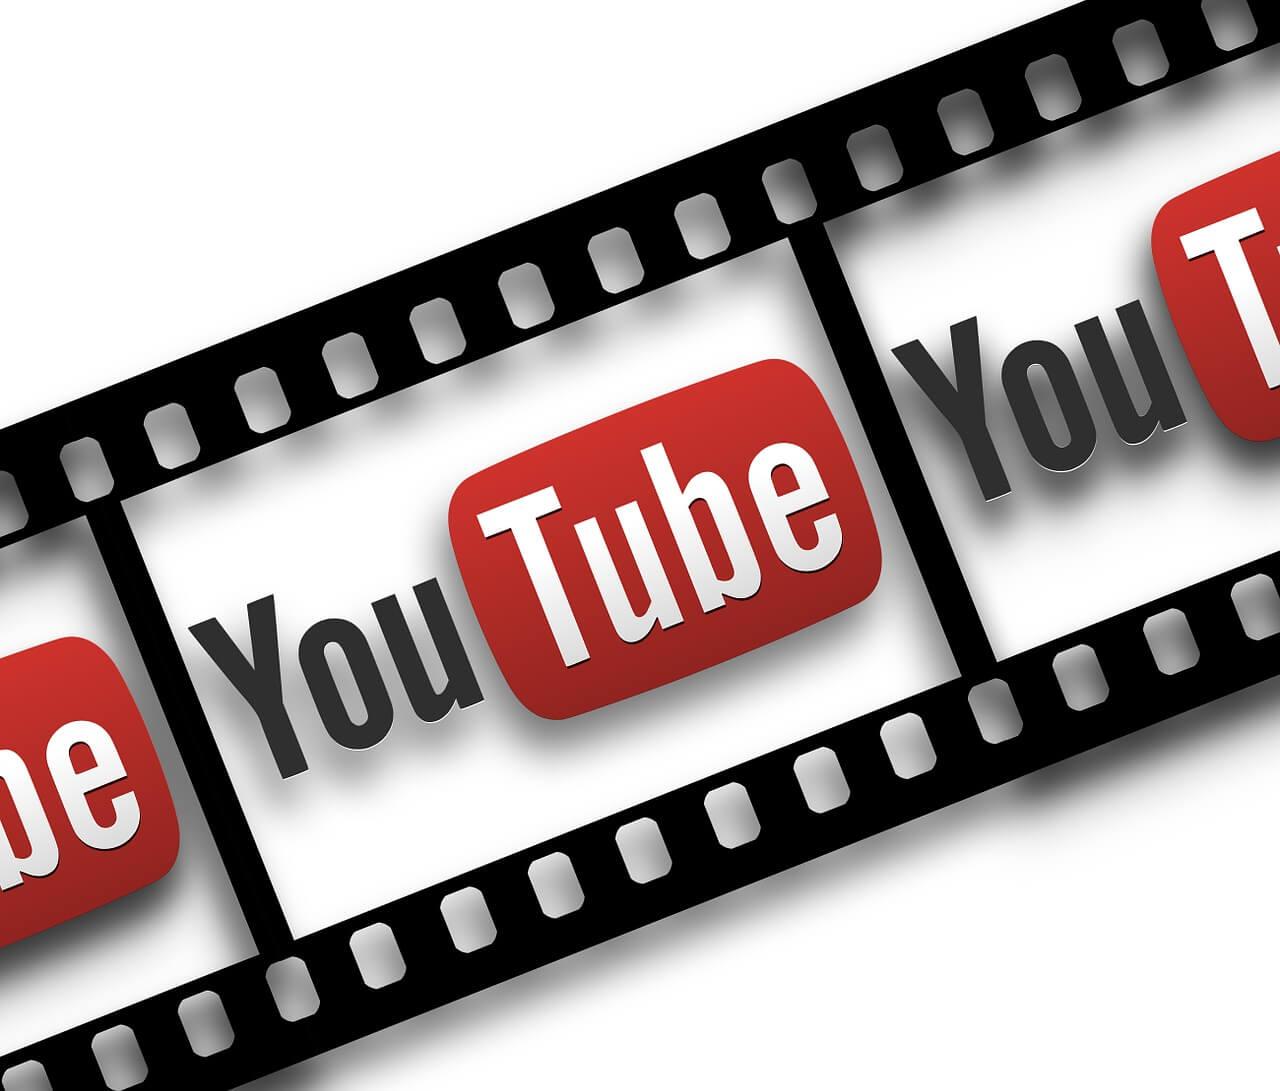 Rudolf Grafe - YouTube Kanal